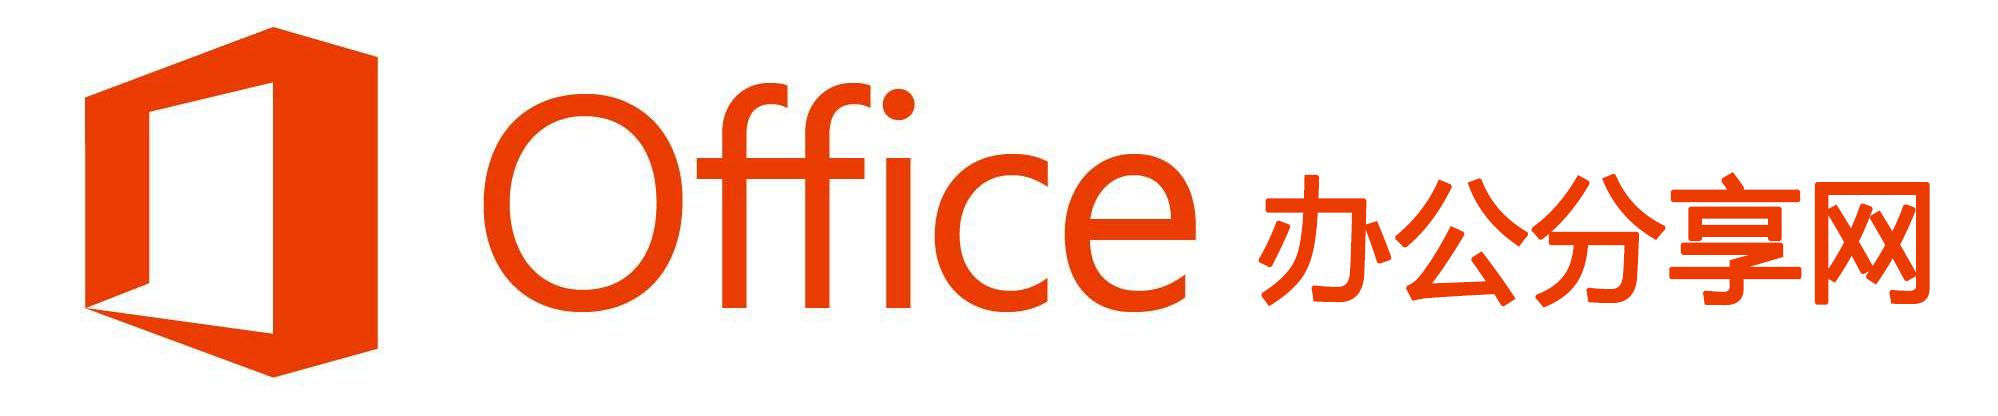 Office|Office教程|office视频教程|office基础教程|office办公软件教程